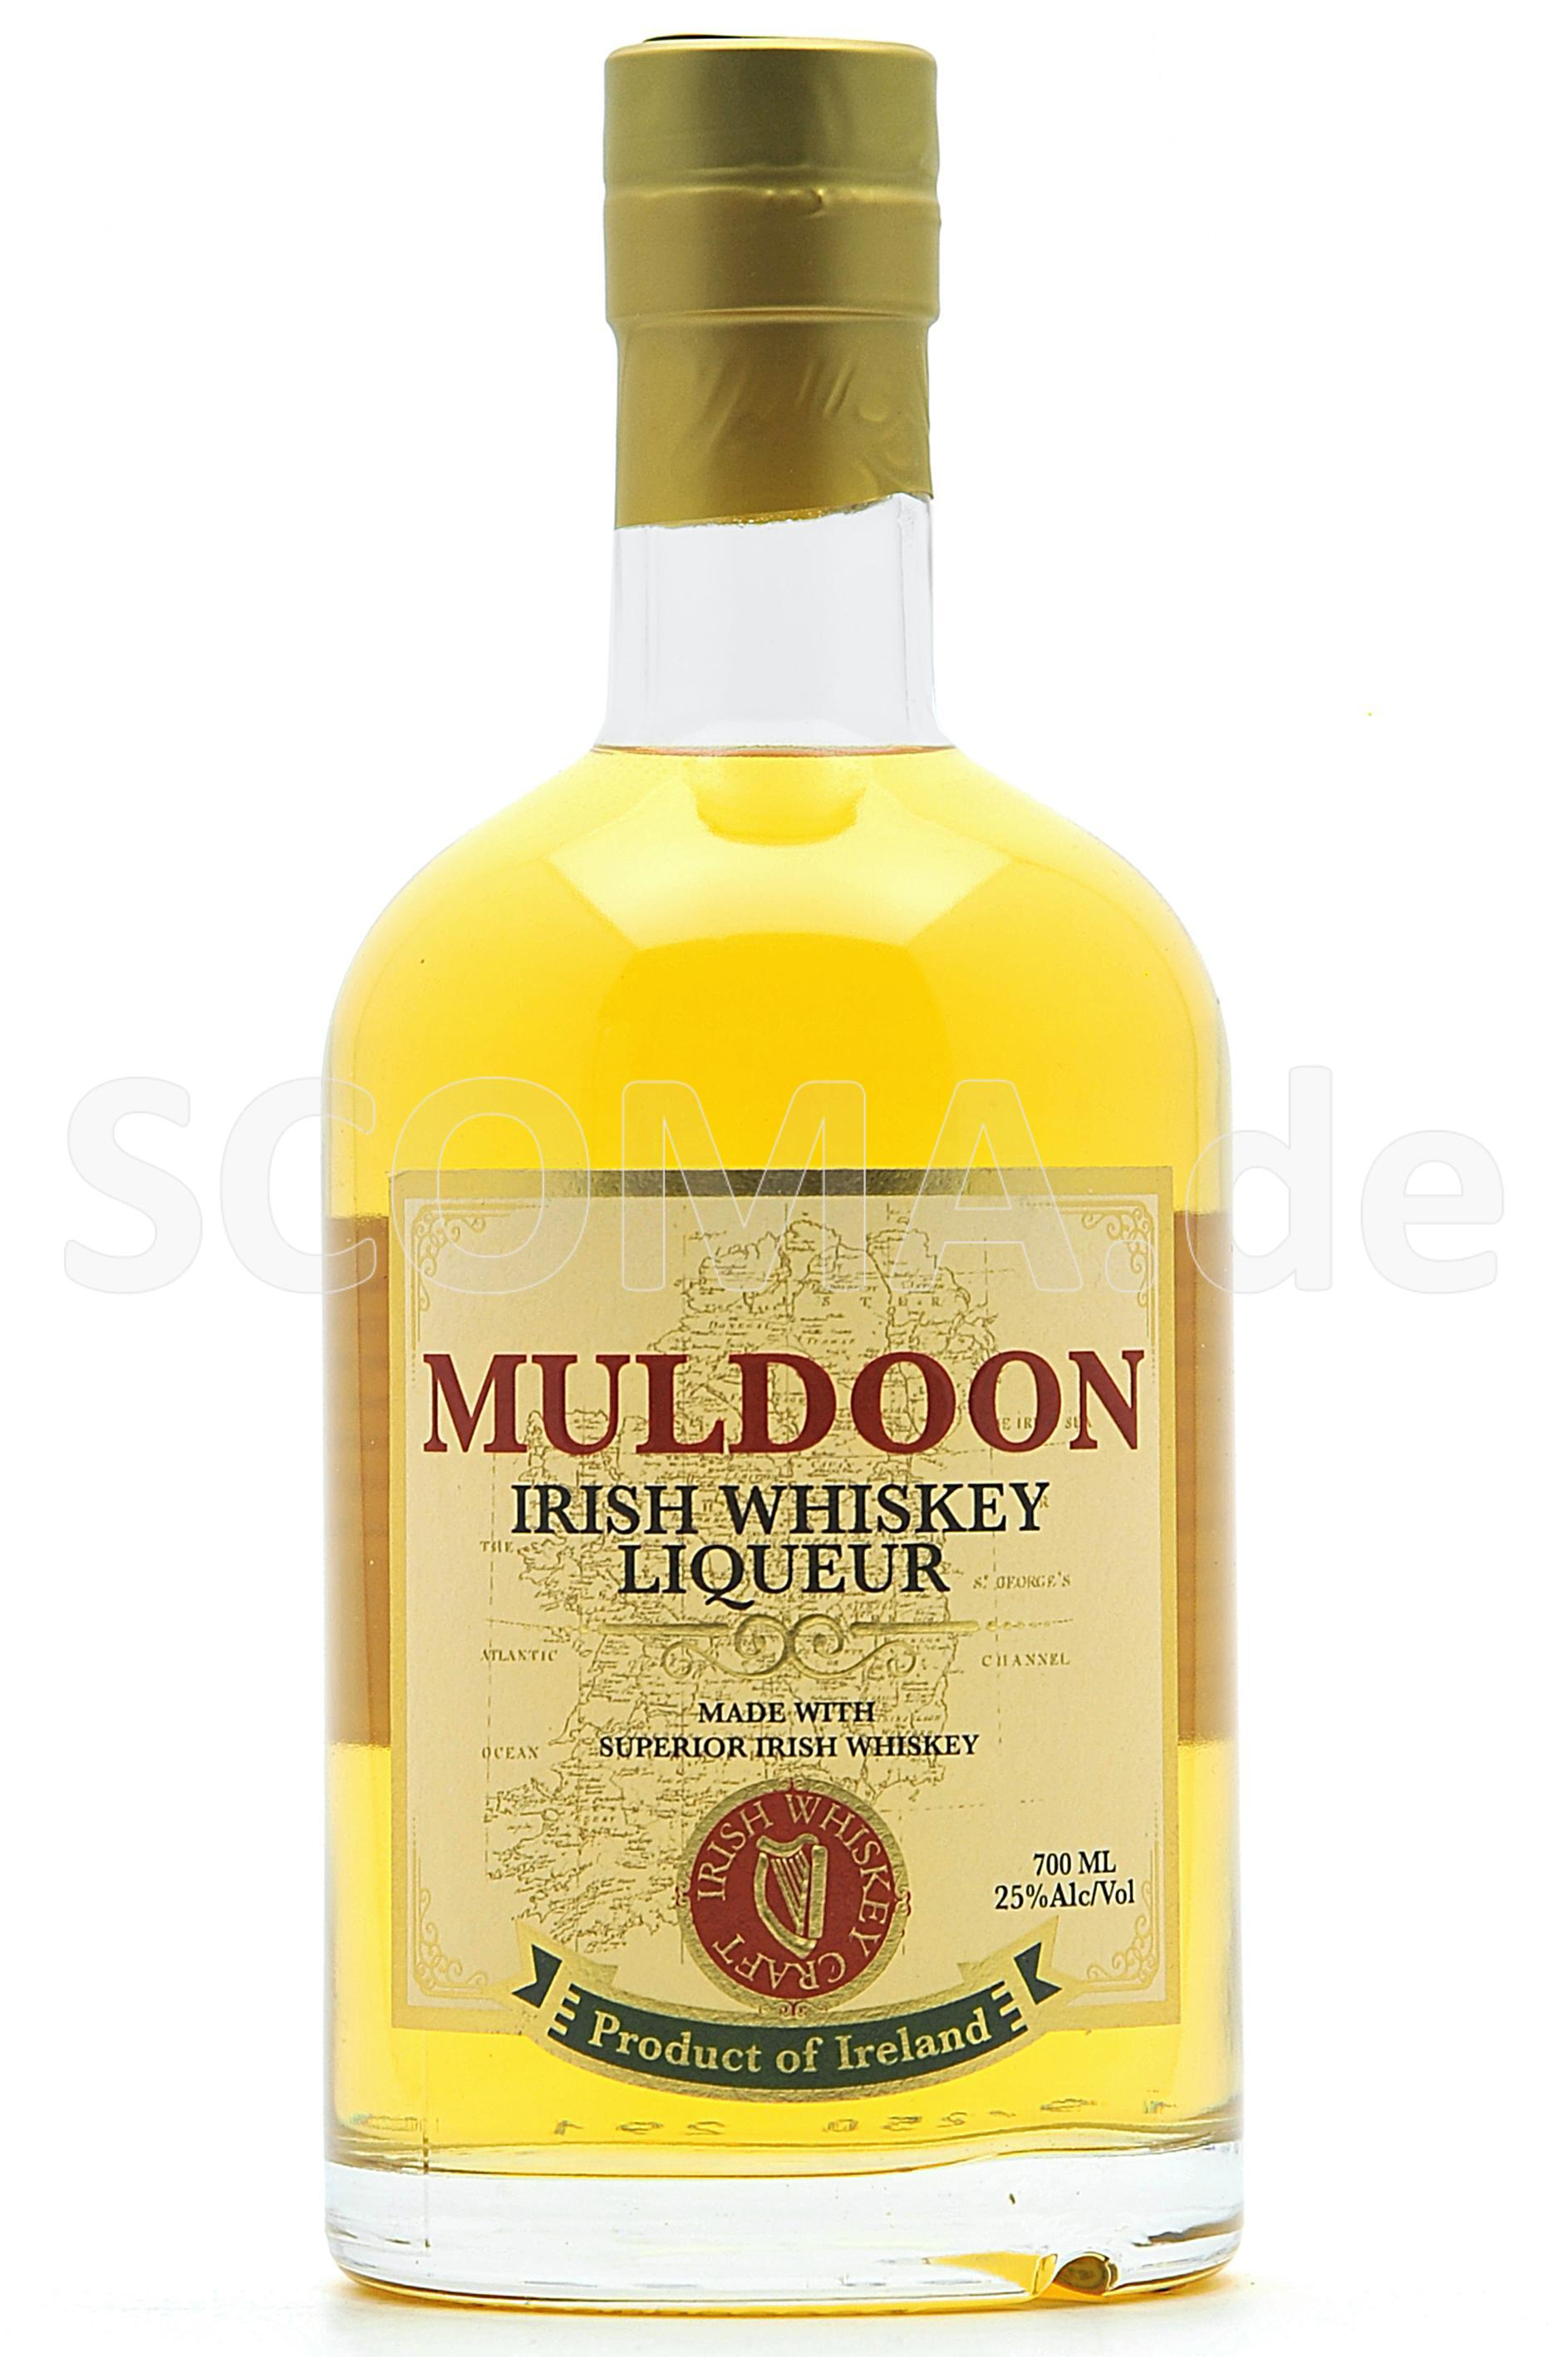 Muldoon Irish Whisky Liqueur